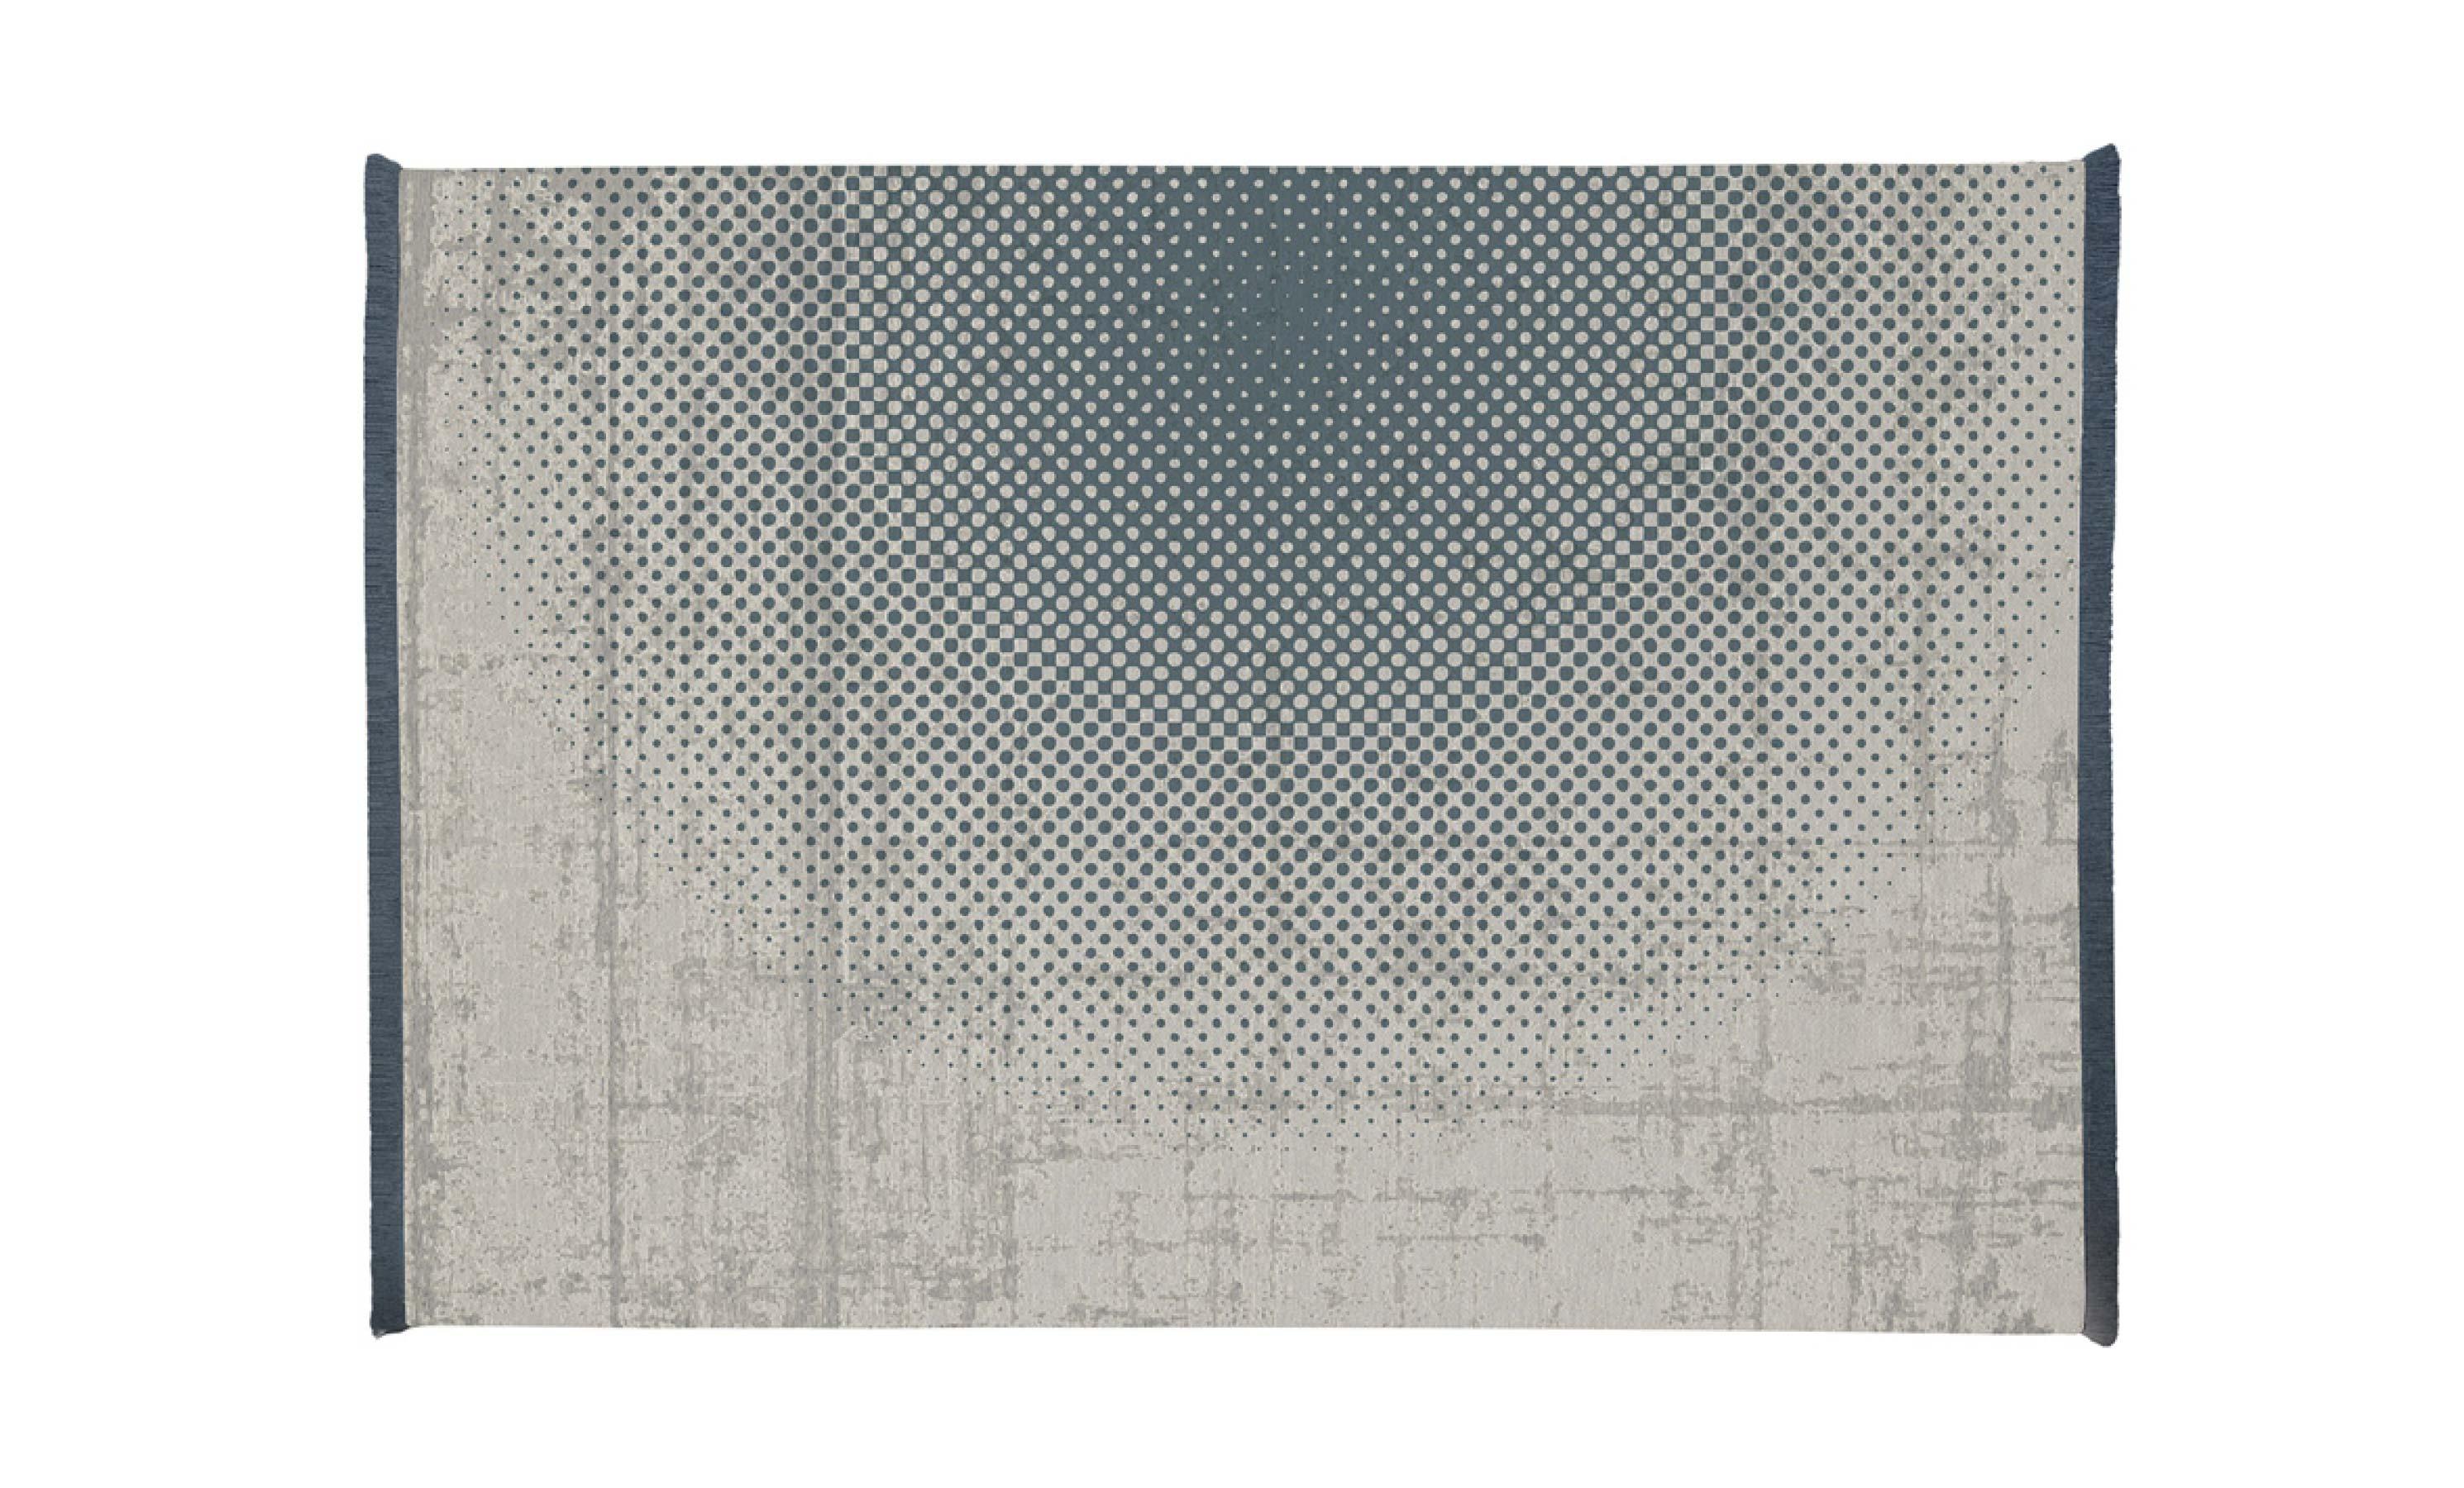 http://desidea.hu/wp-content/uploads/2019/11/tappeto-rug-dots.jpg